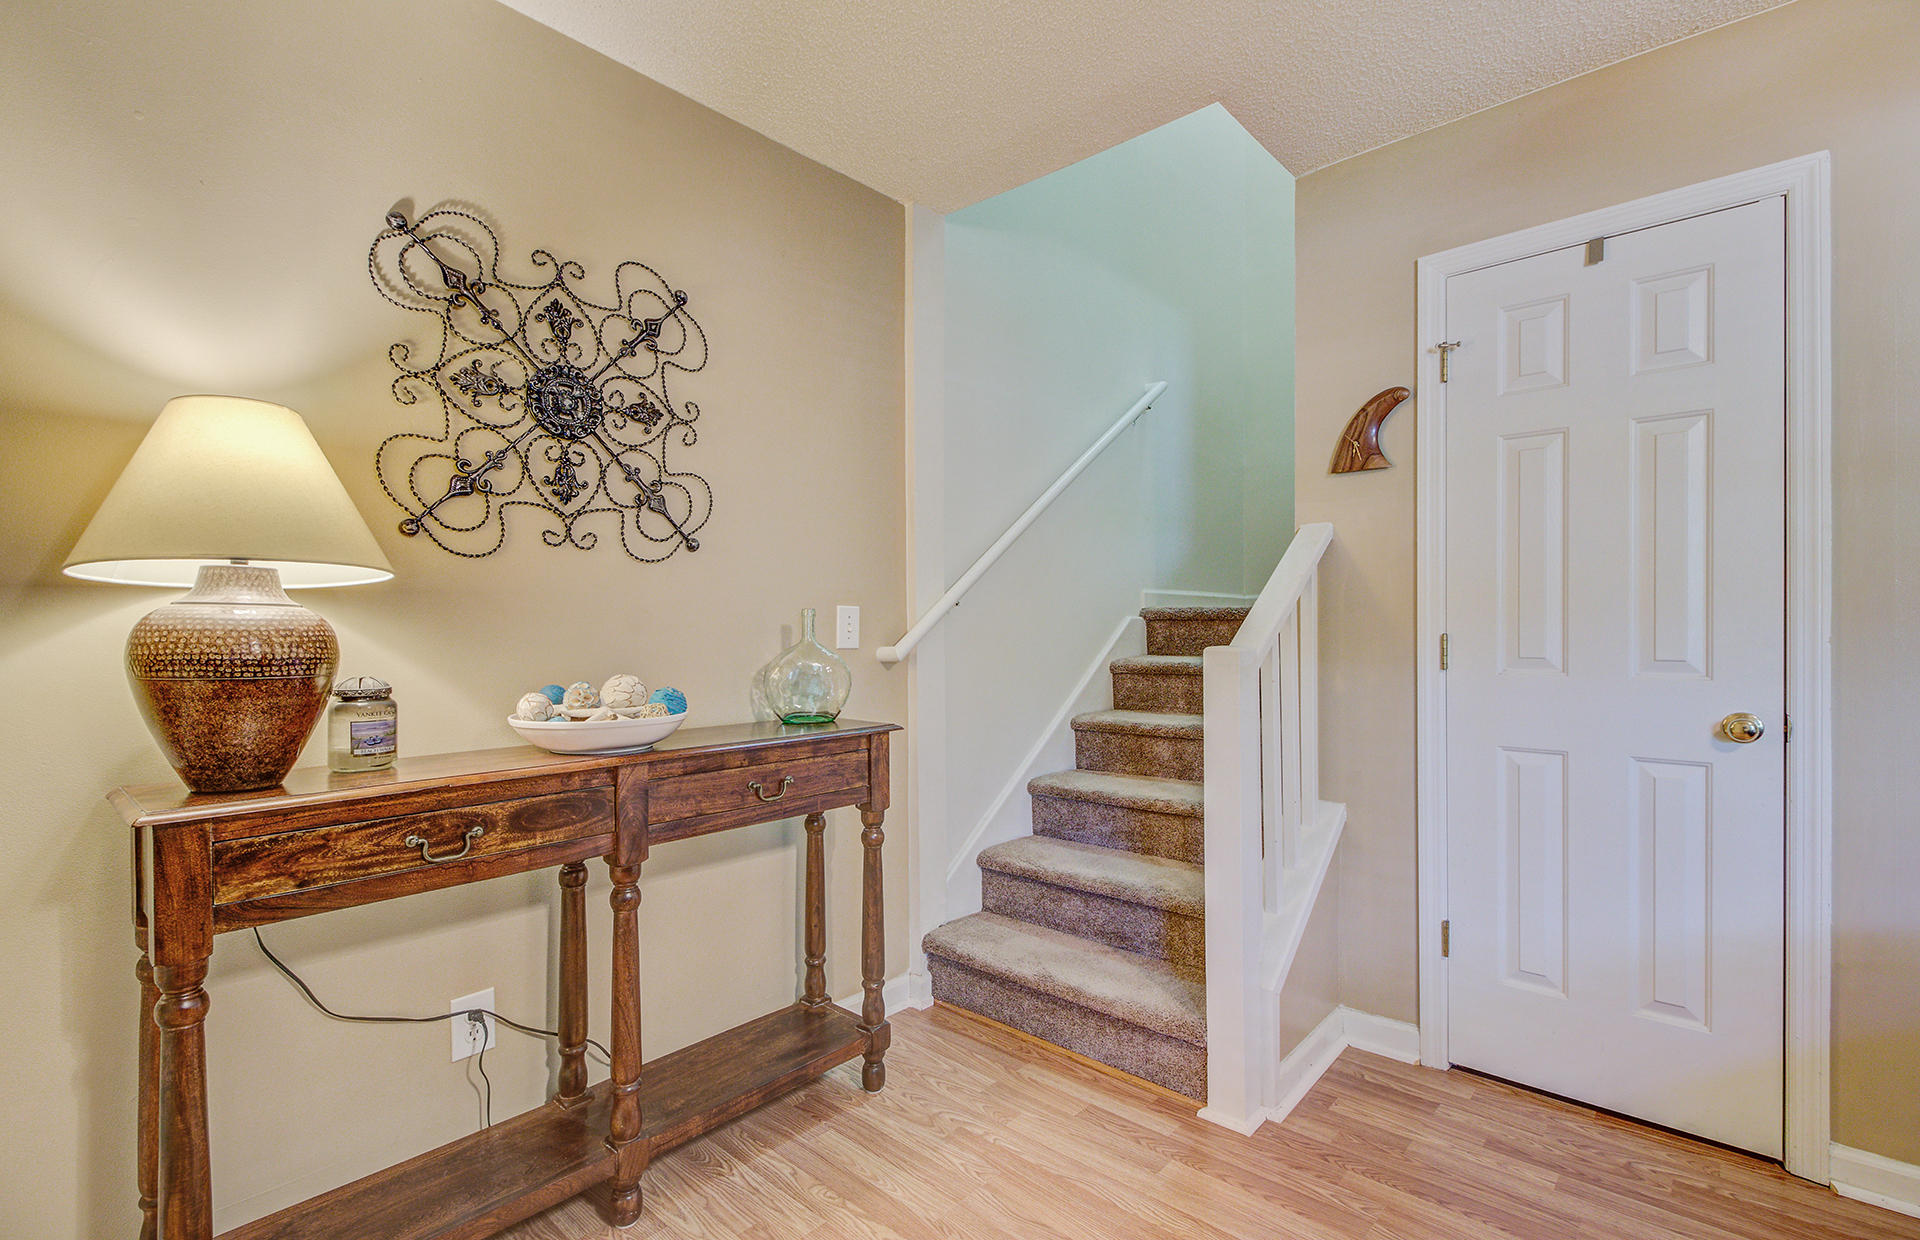 Wando East Homes For Sale - 1664 Hunters Run, Mount Pleasant, SC - 23